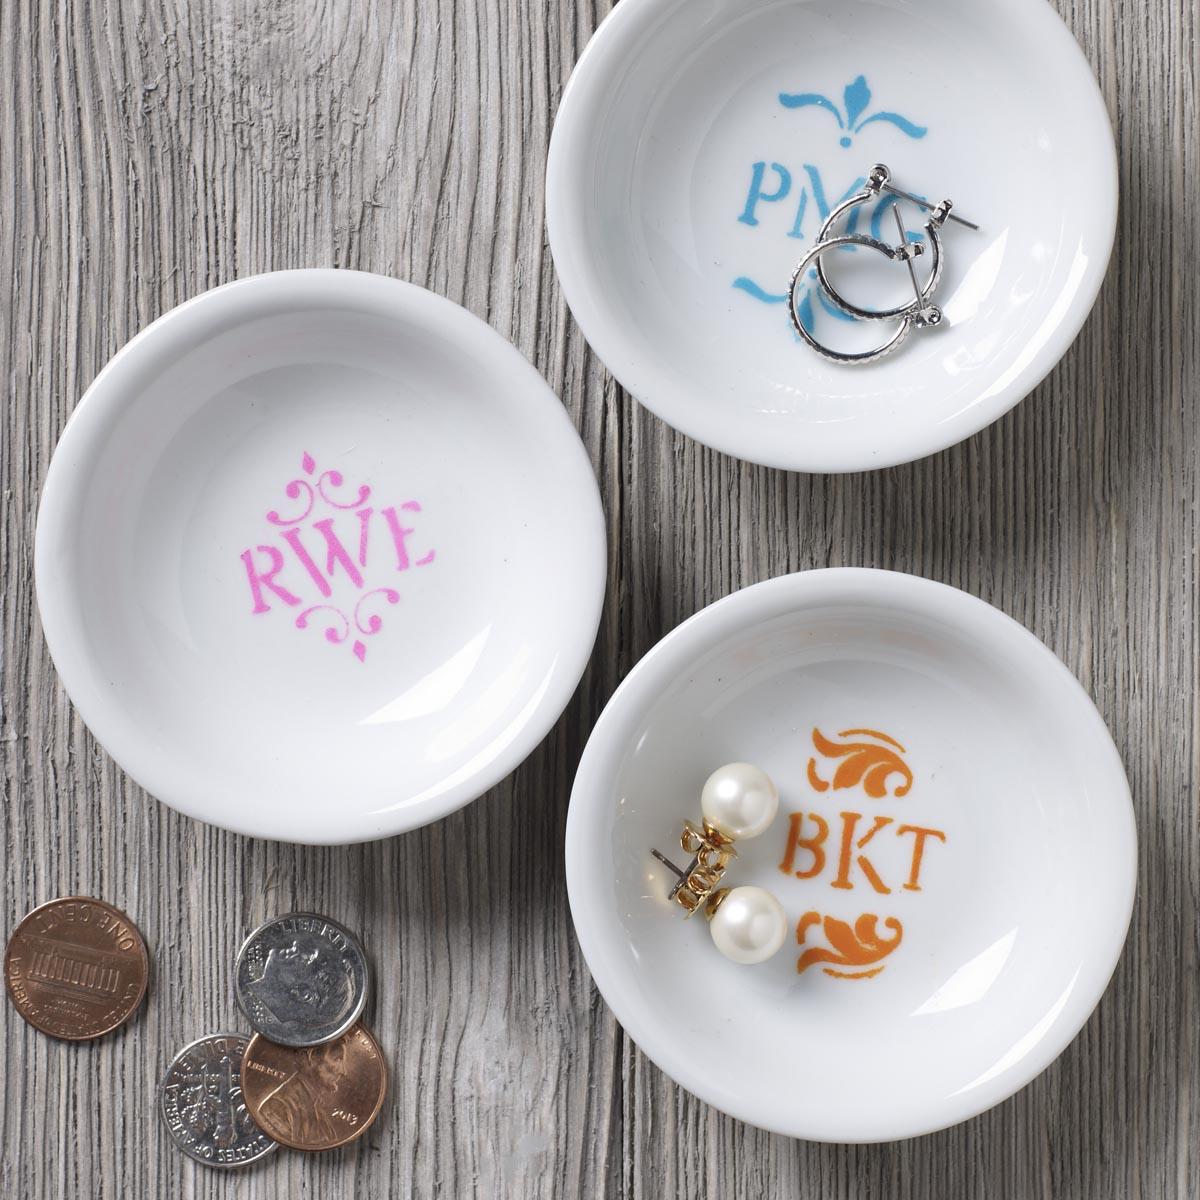 FolkArt ® Painting Stencils - Mini - Monogram